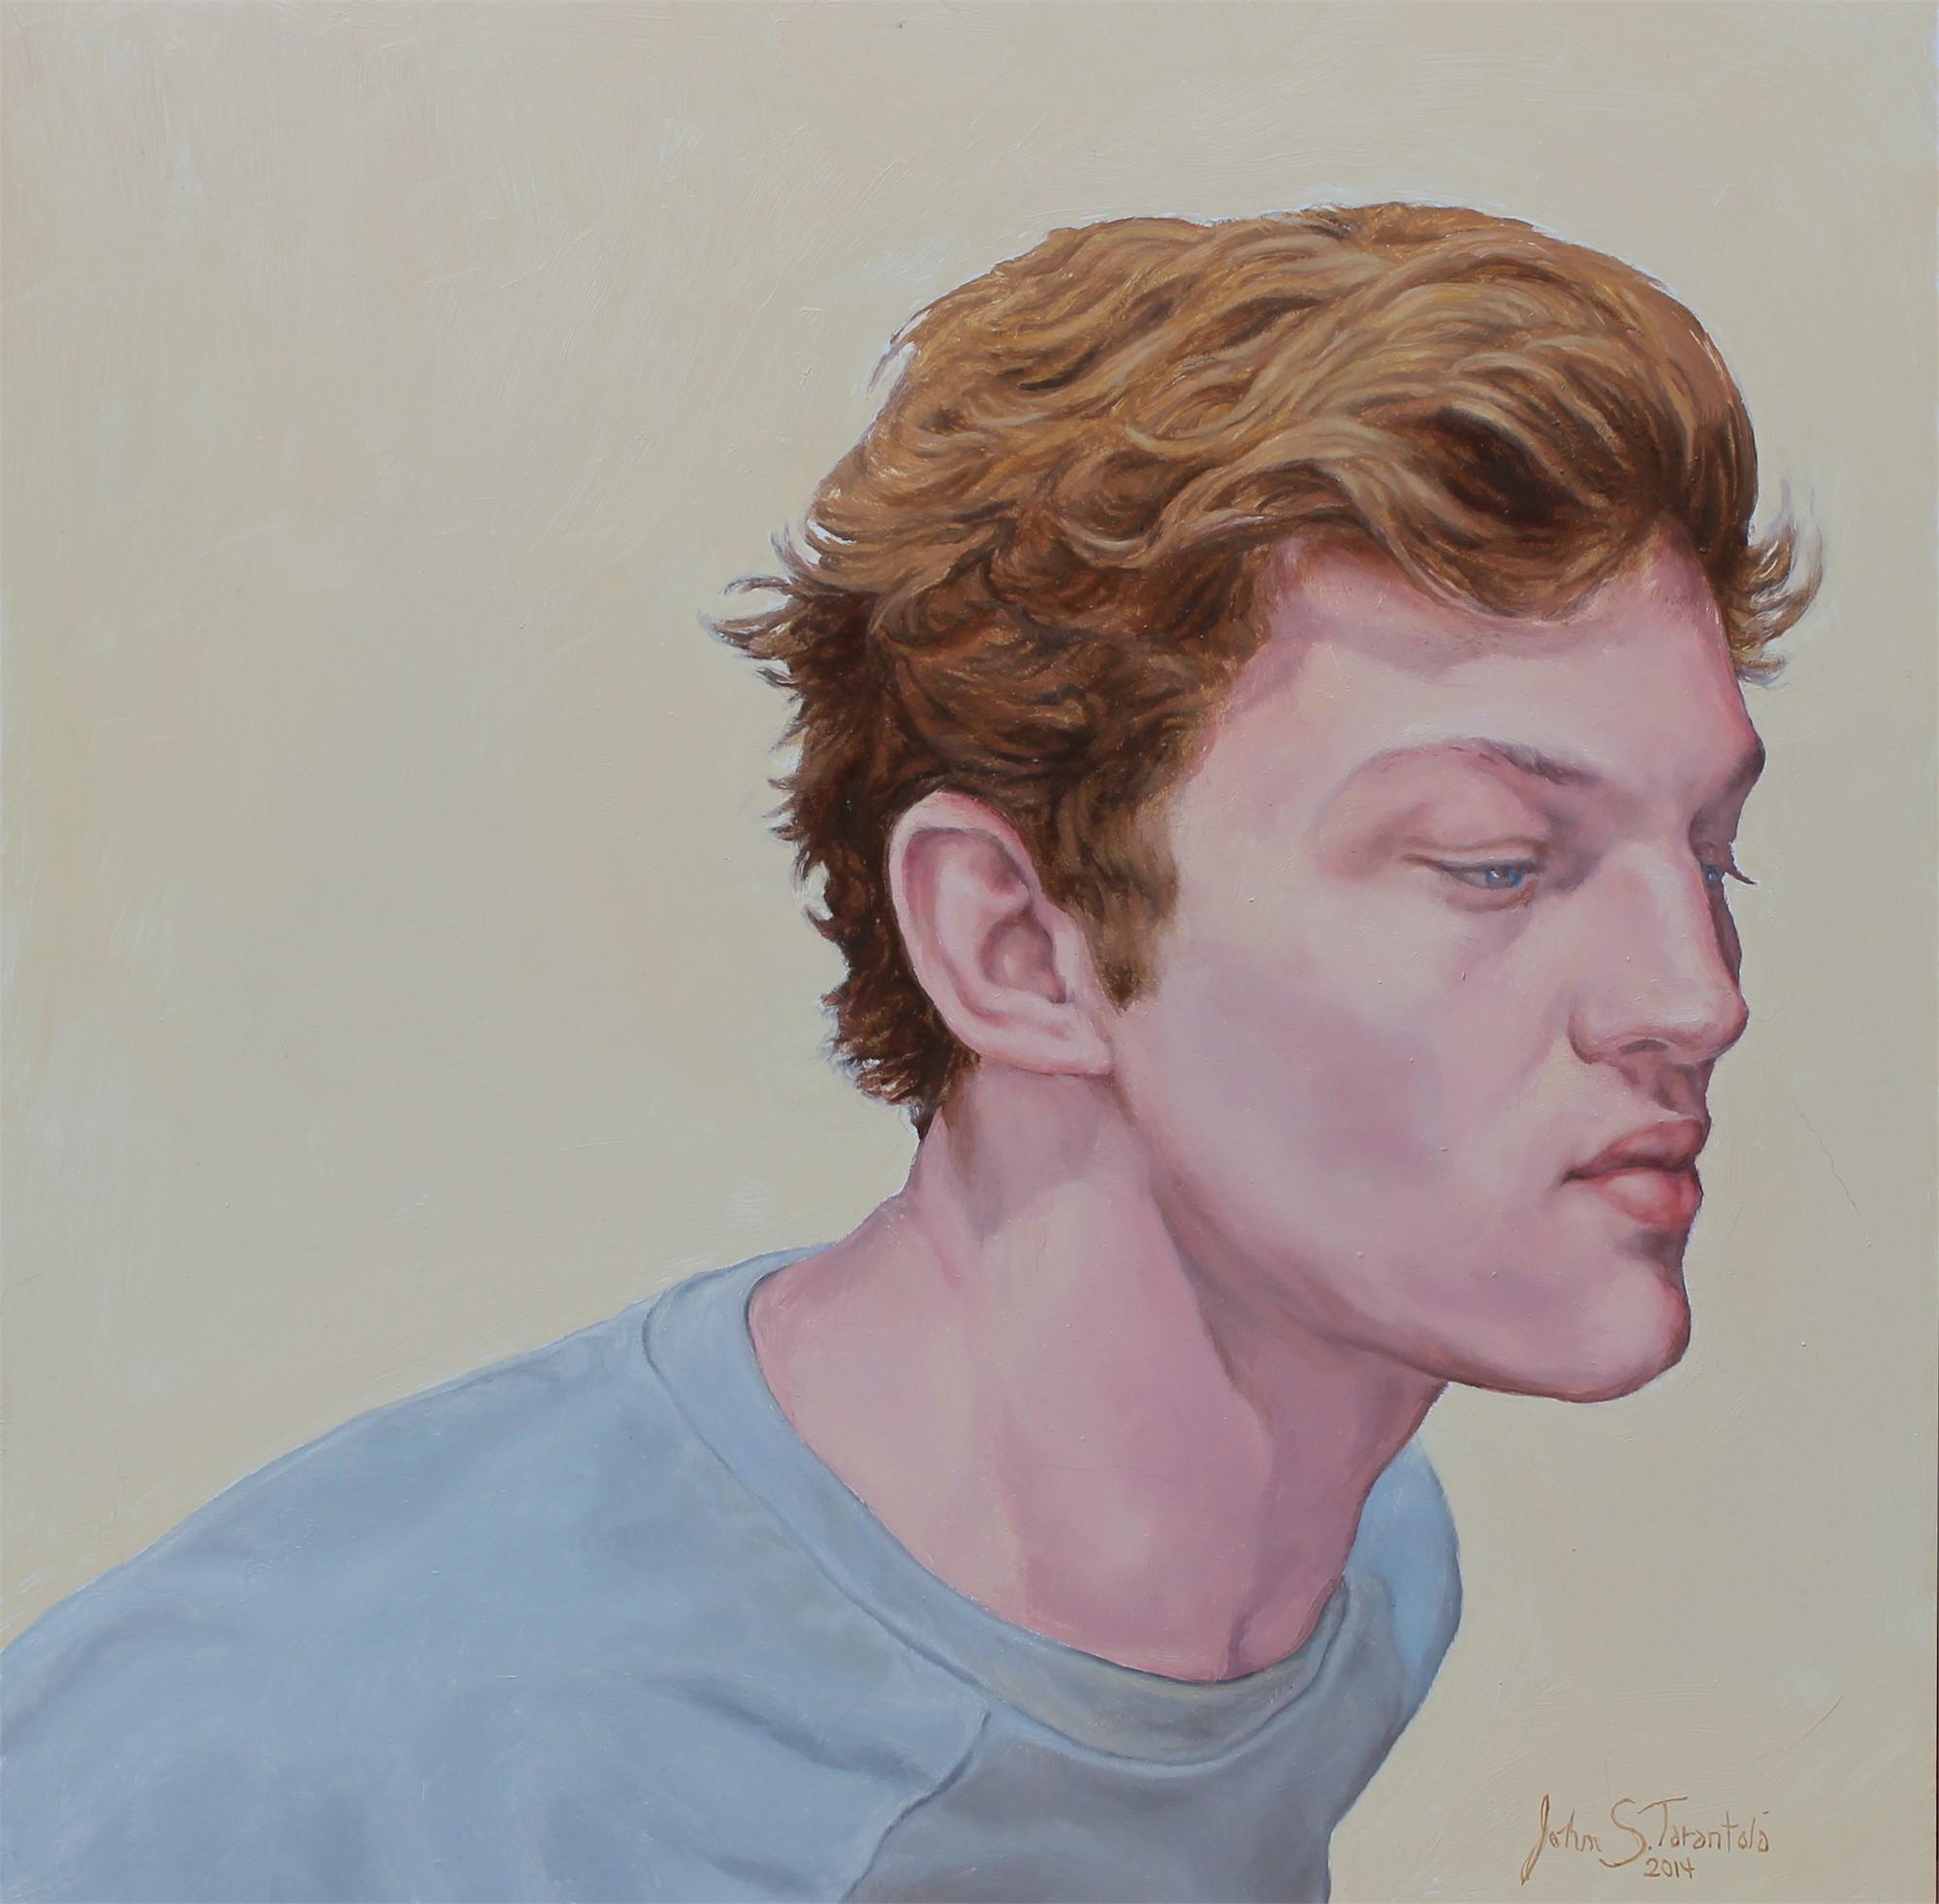 Sebastian by John Tarantola